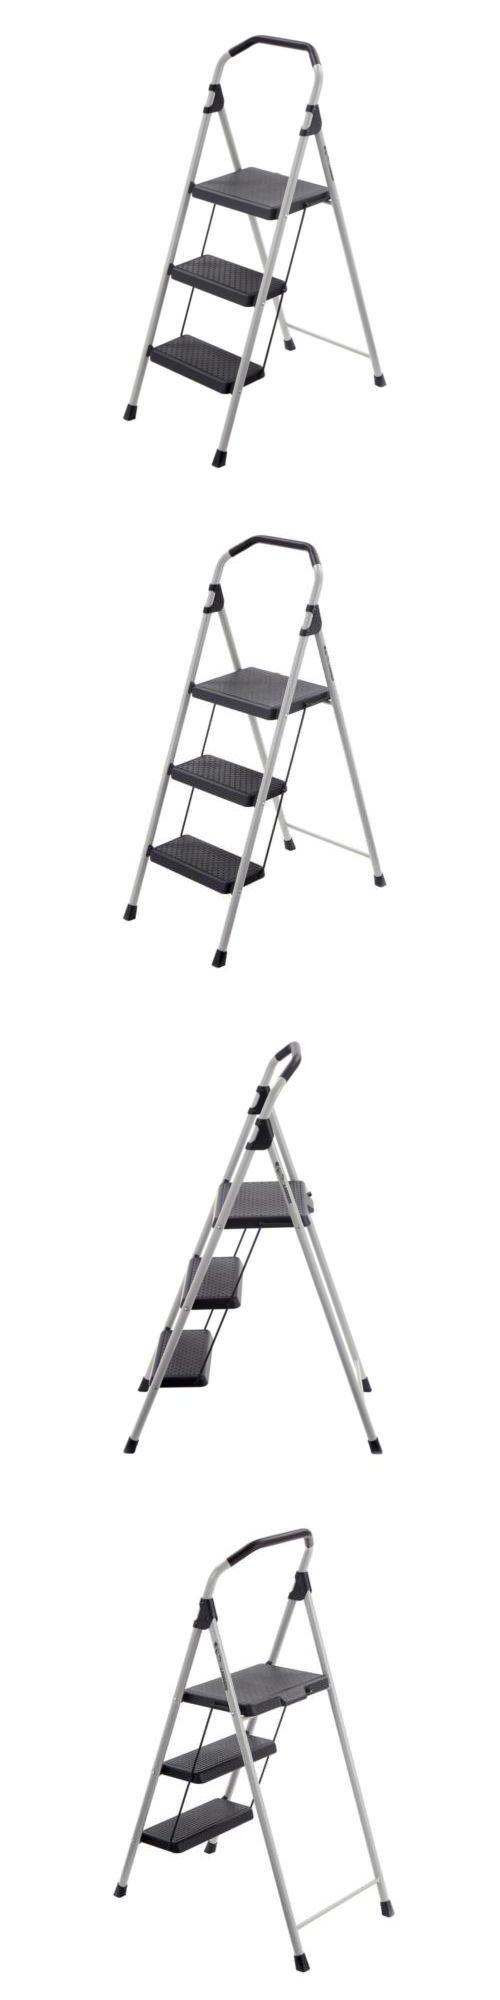 Awe Inspiring Ladders 112567 Gorila Ladders 3 Step Lightweight Steel Step Evergreenethics Interior Chair Design Evergreenethicsorg